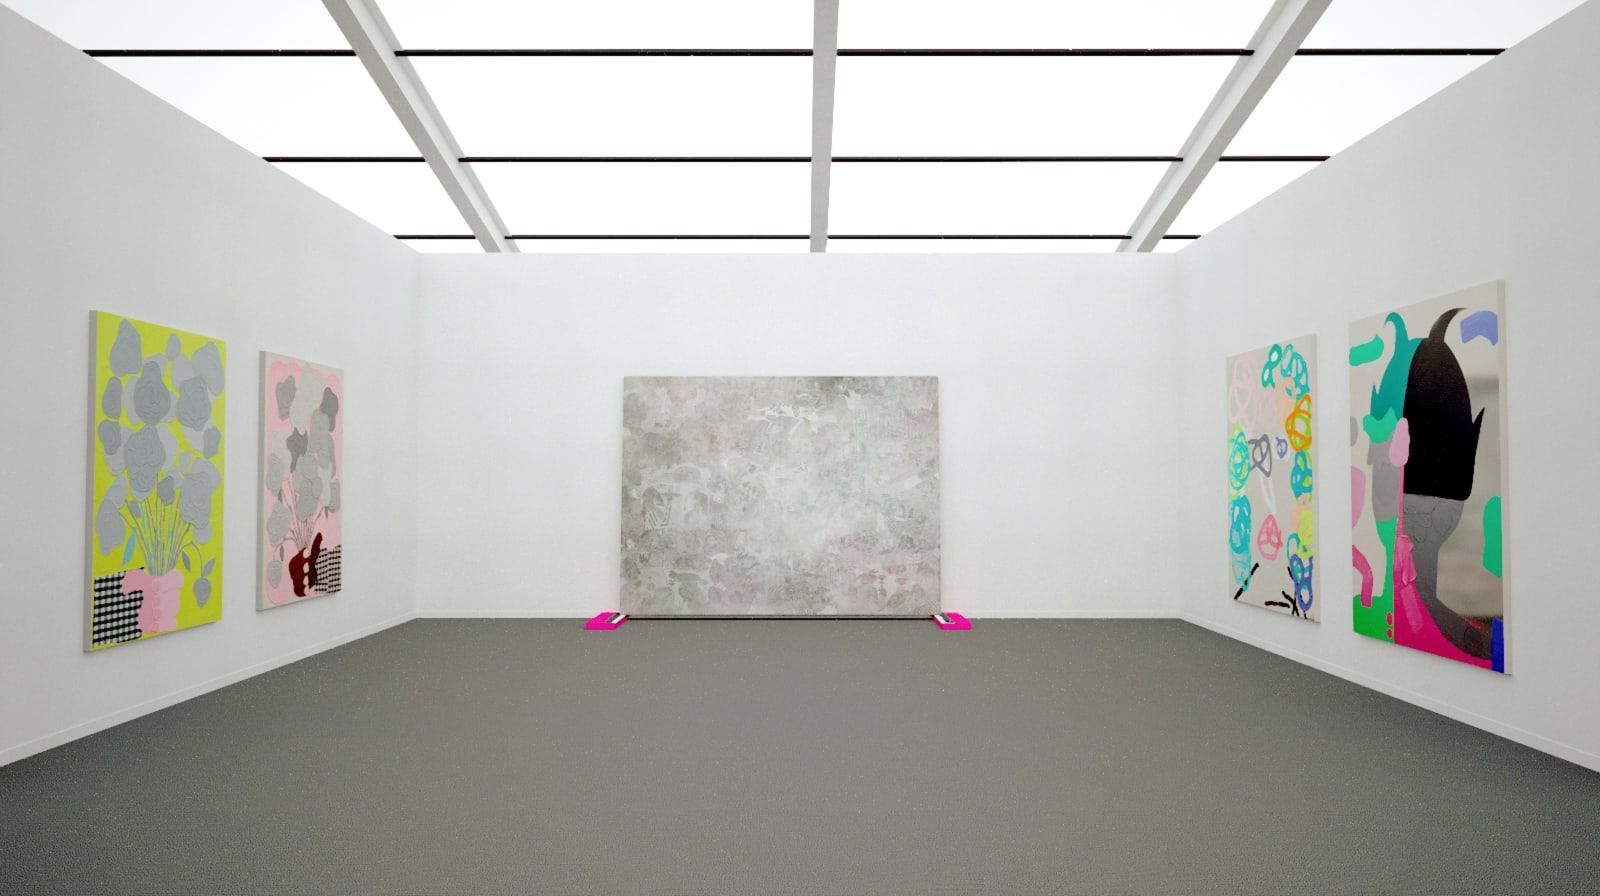 Works by José Lerma at Frieze New York (installation view), 2020 Kavi gupta